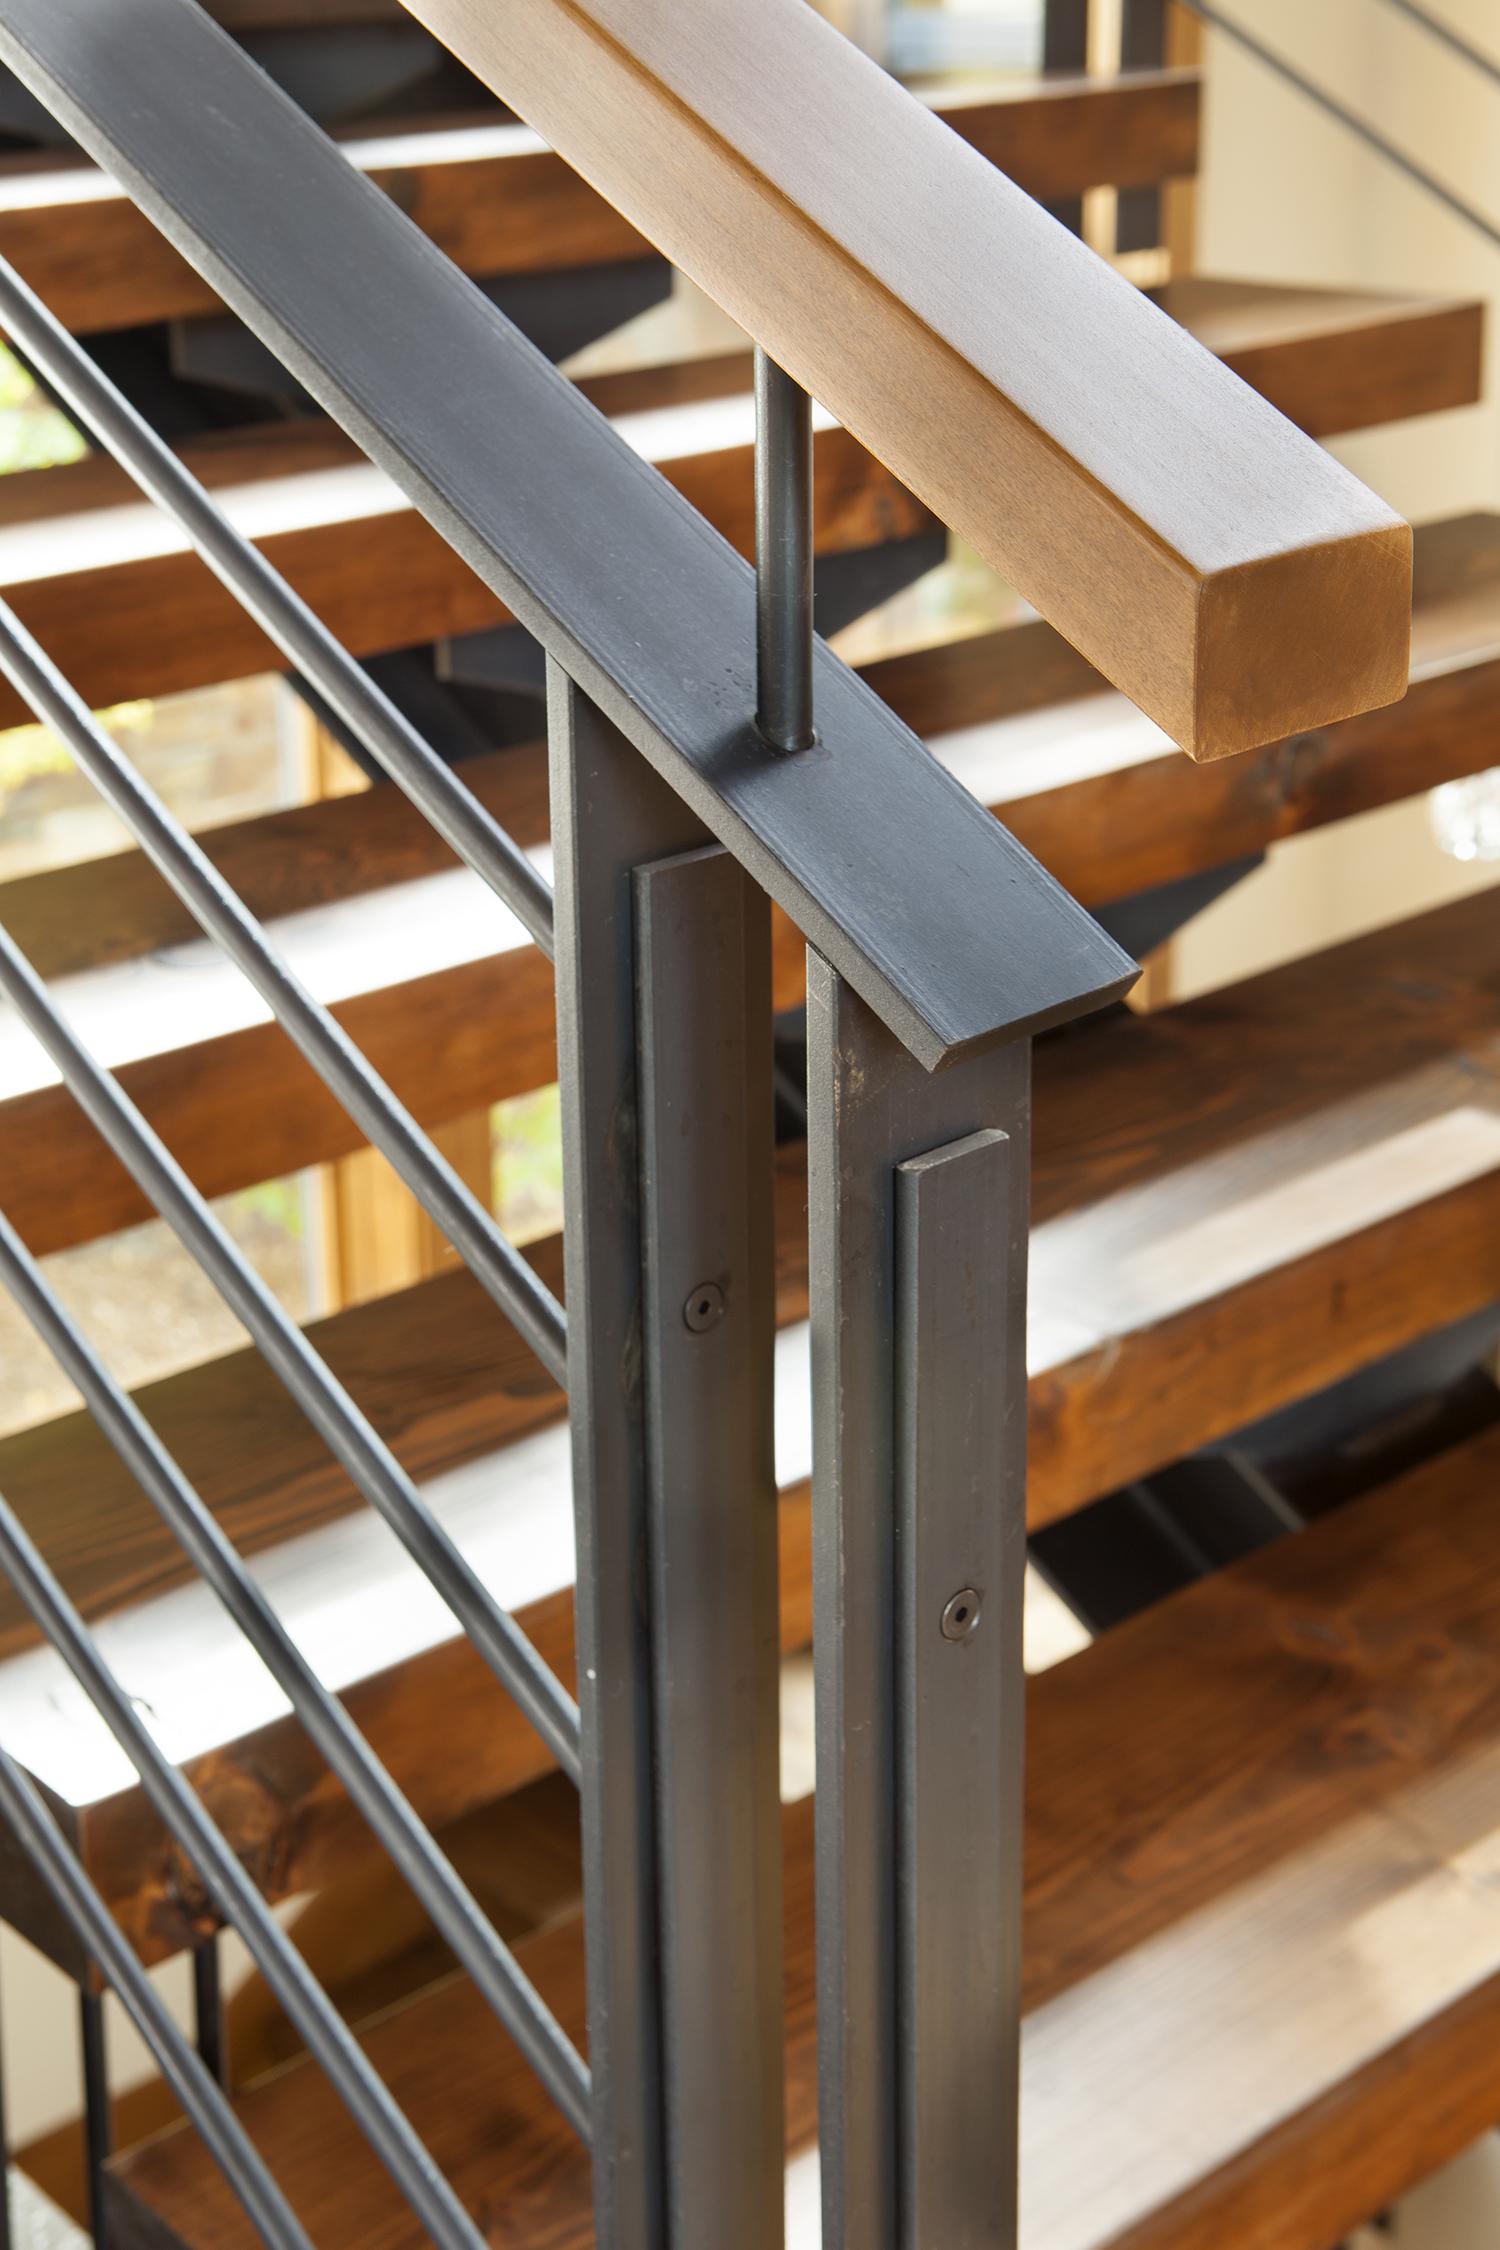 Lot 483_Staircase_Handrail Detail.jpg